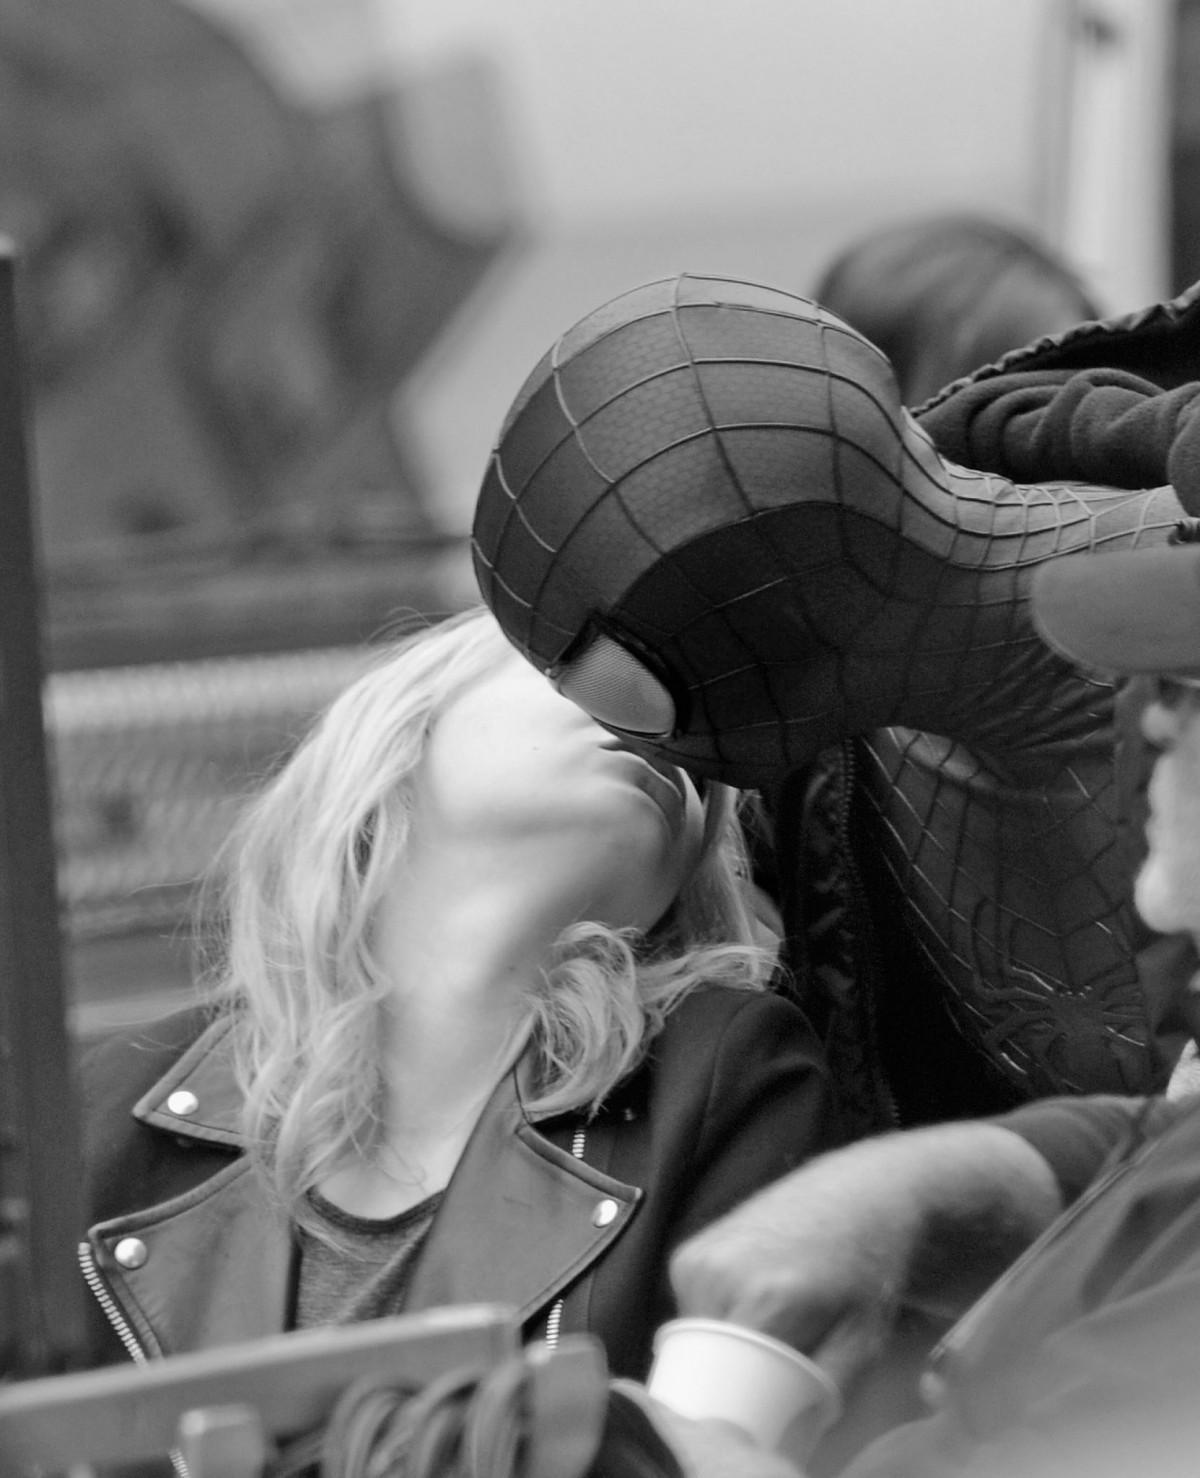 Emma-Stone-snuck-kiss-her-masked-boyfriend-Andrew-Garfield copy